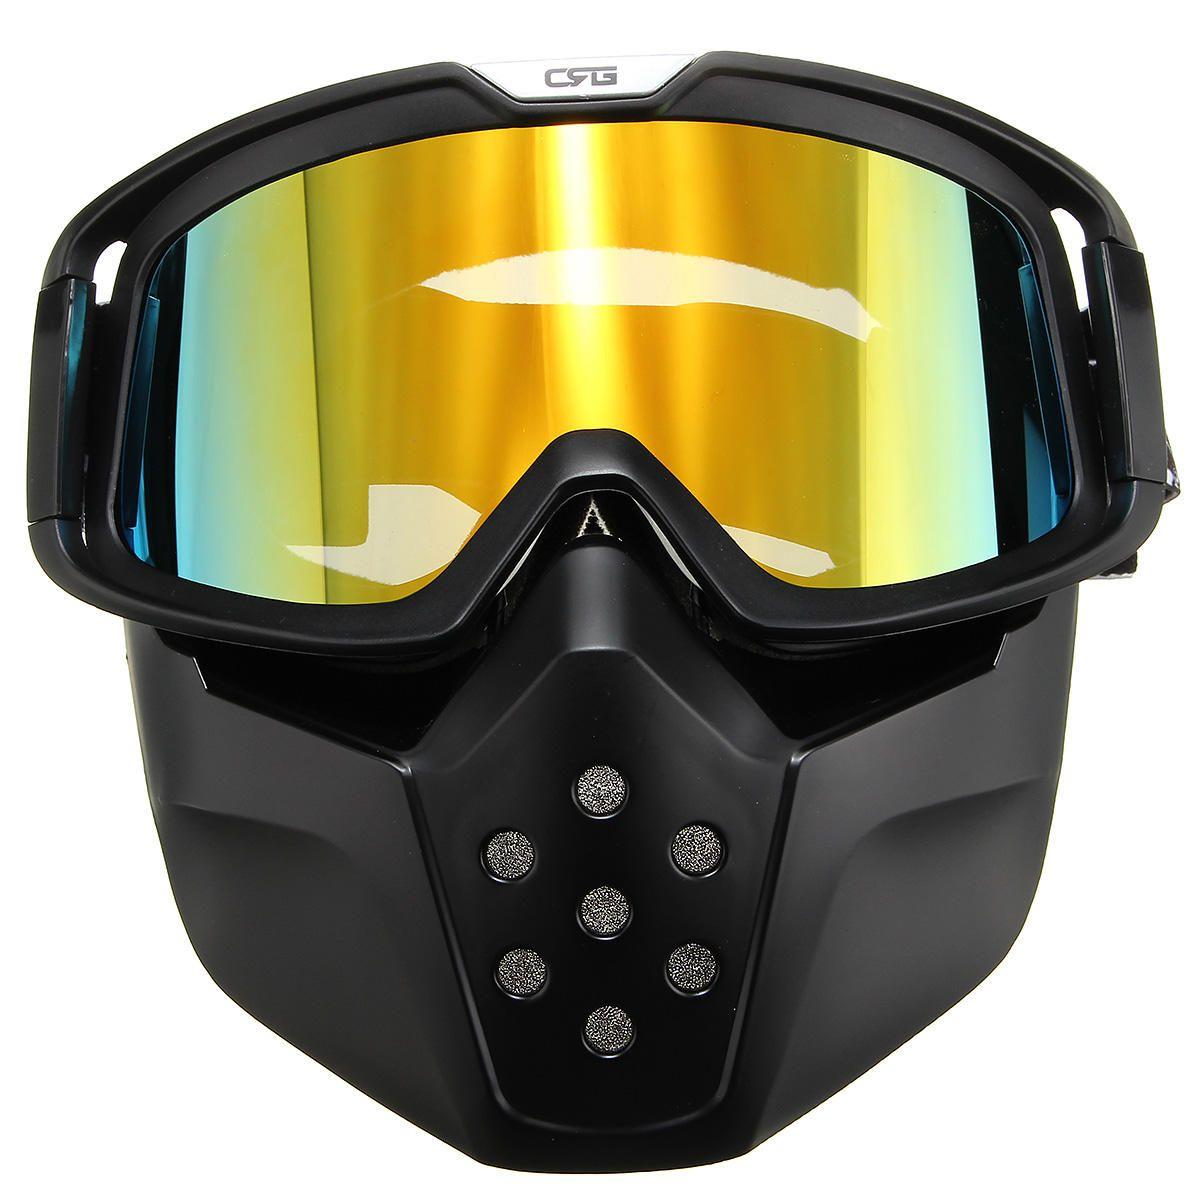 MOB US$27.31  Motorcycle Helmet Yellow Lens Detachable Goggles Modular Face Mask Shield